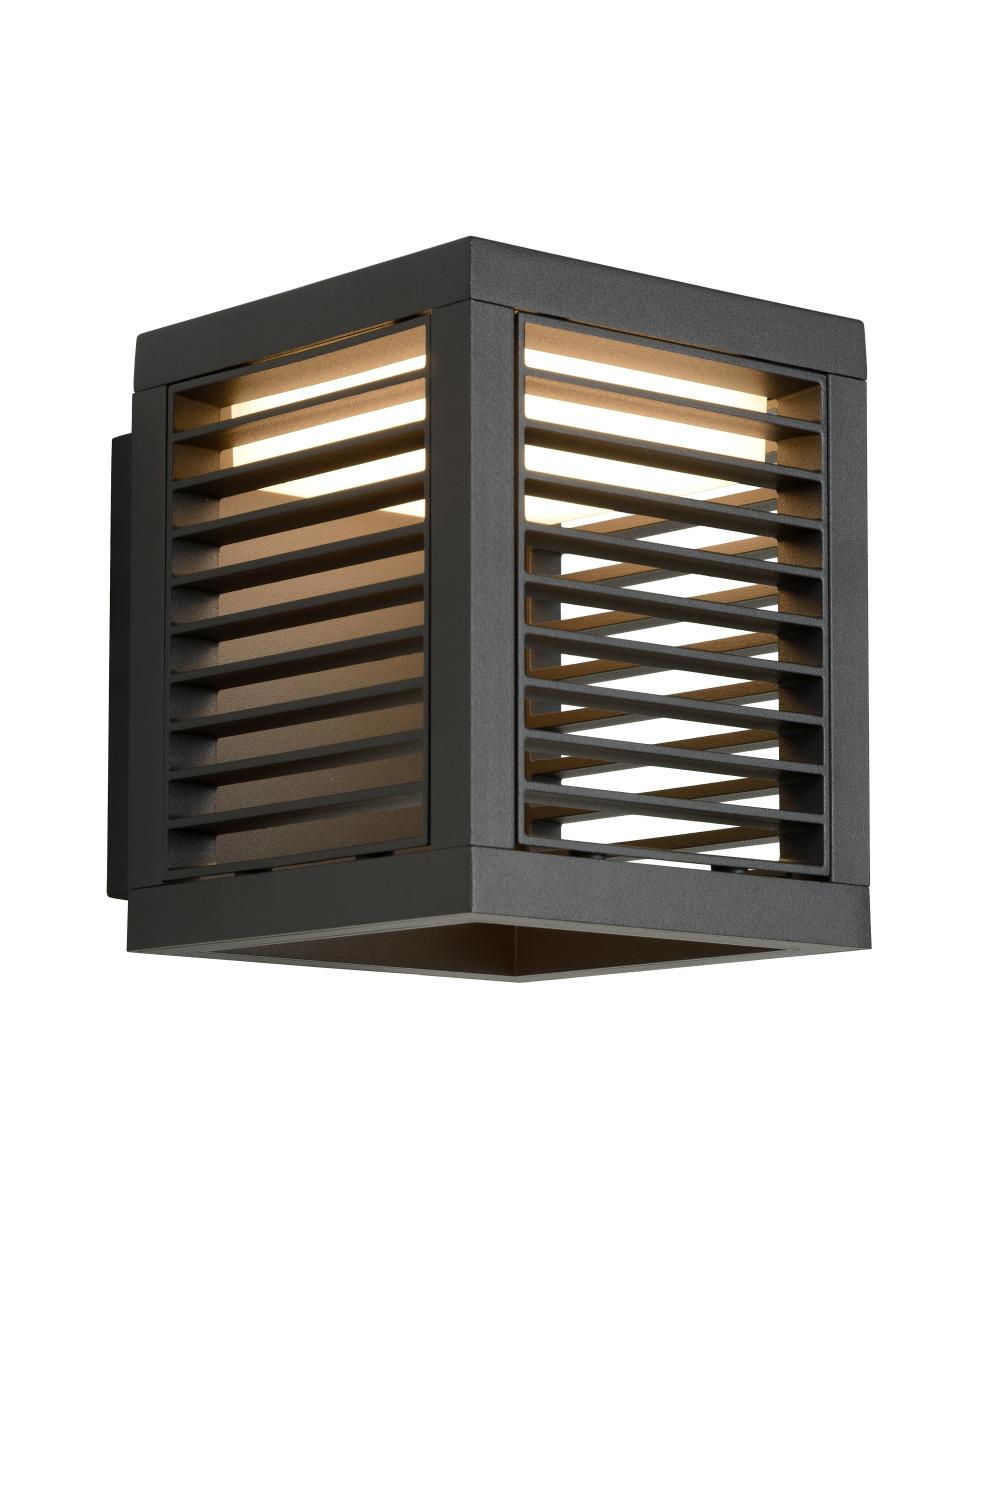 Lucide SLITS Wandlamp LED 10W Antraciet